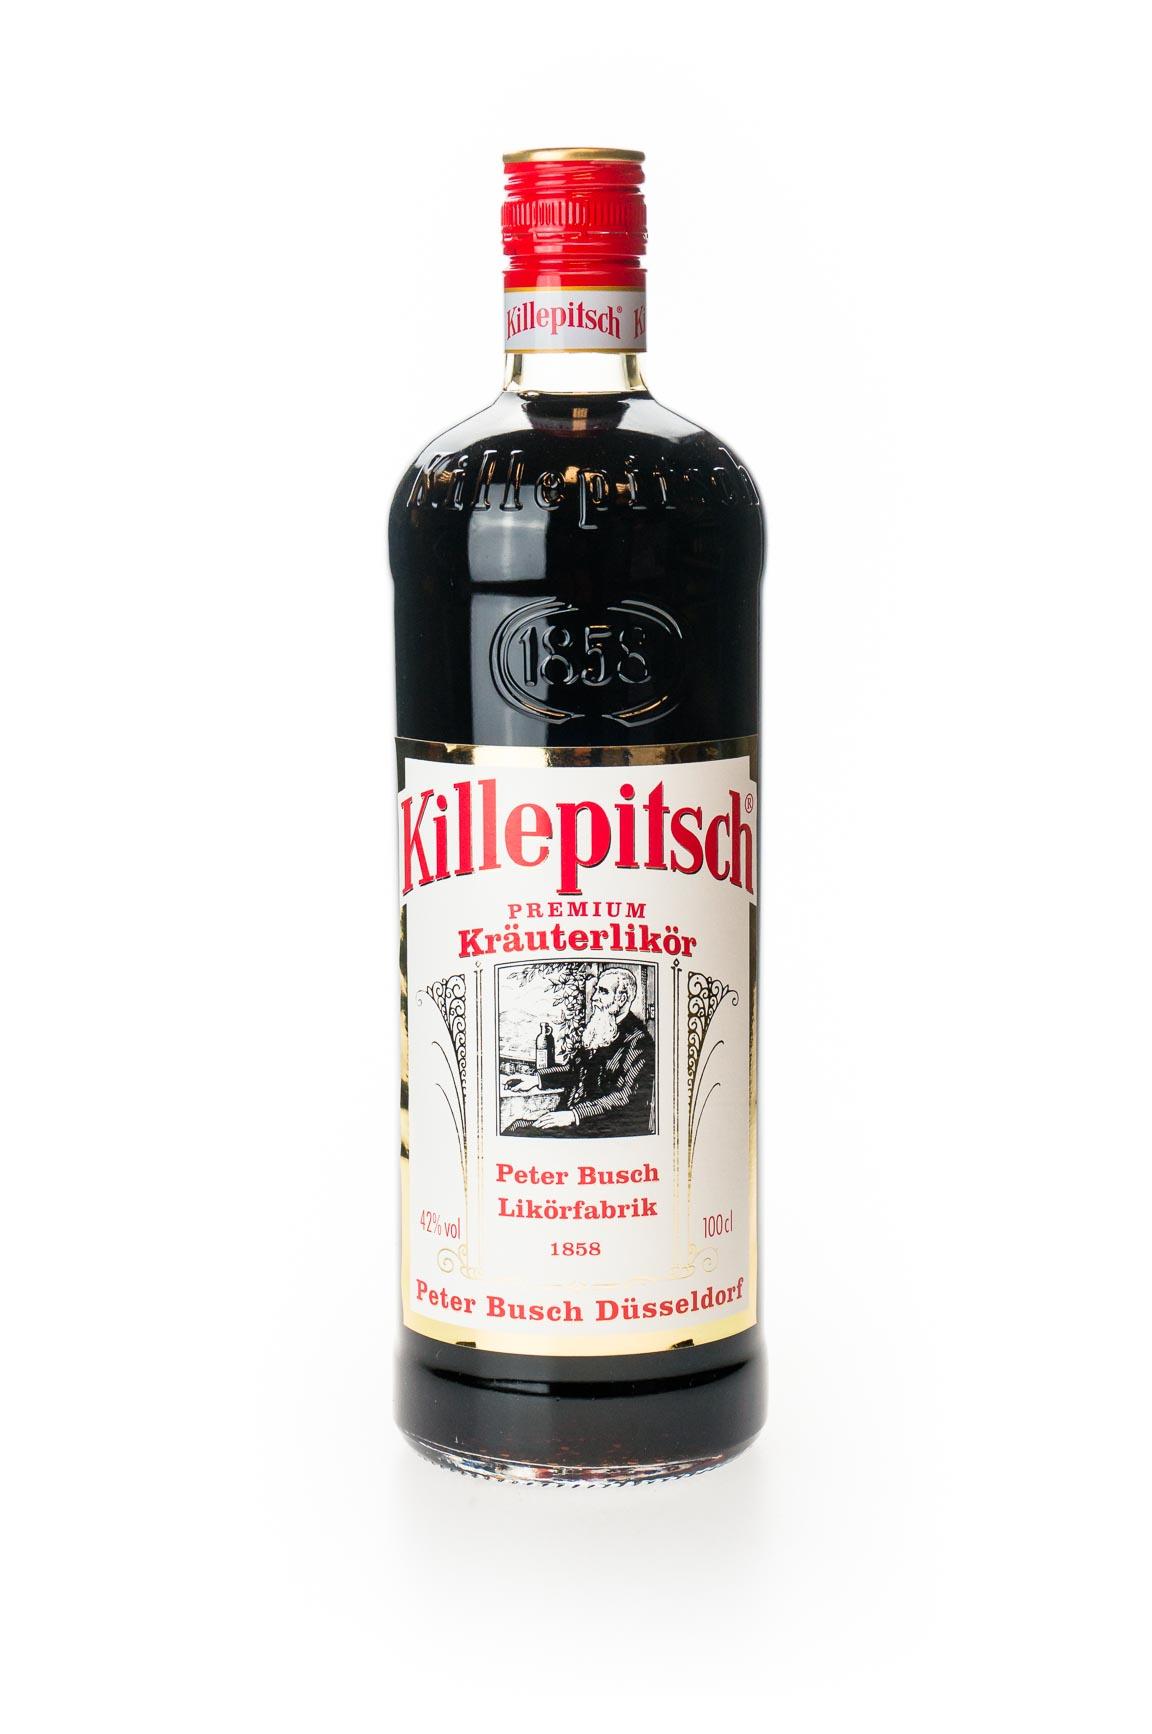 Killepitsch Kräuterlikör 1L kaufen | CONALCO®